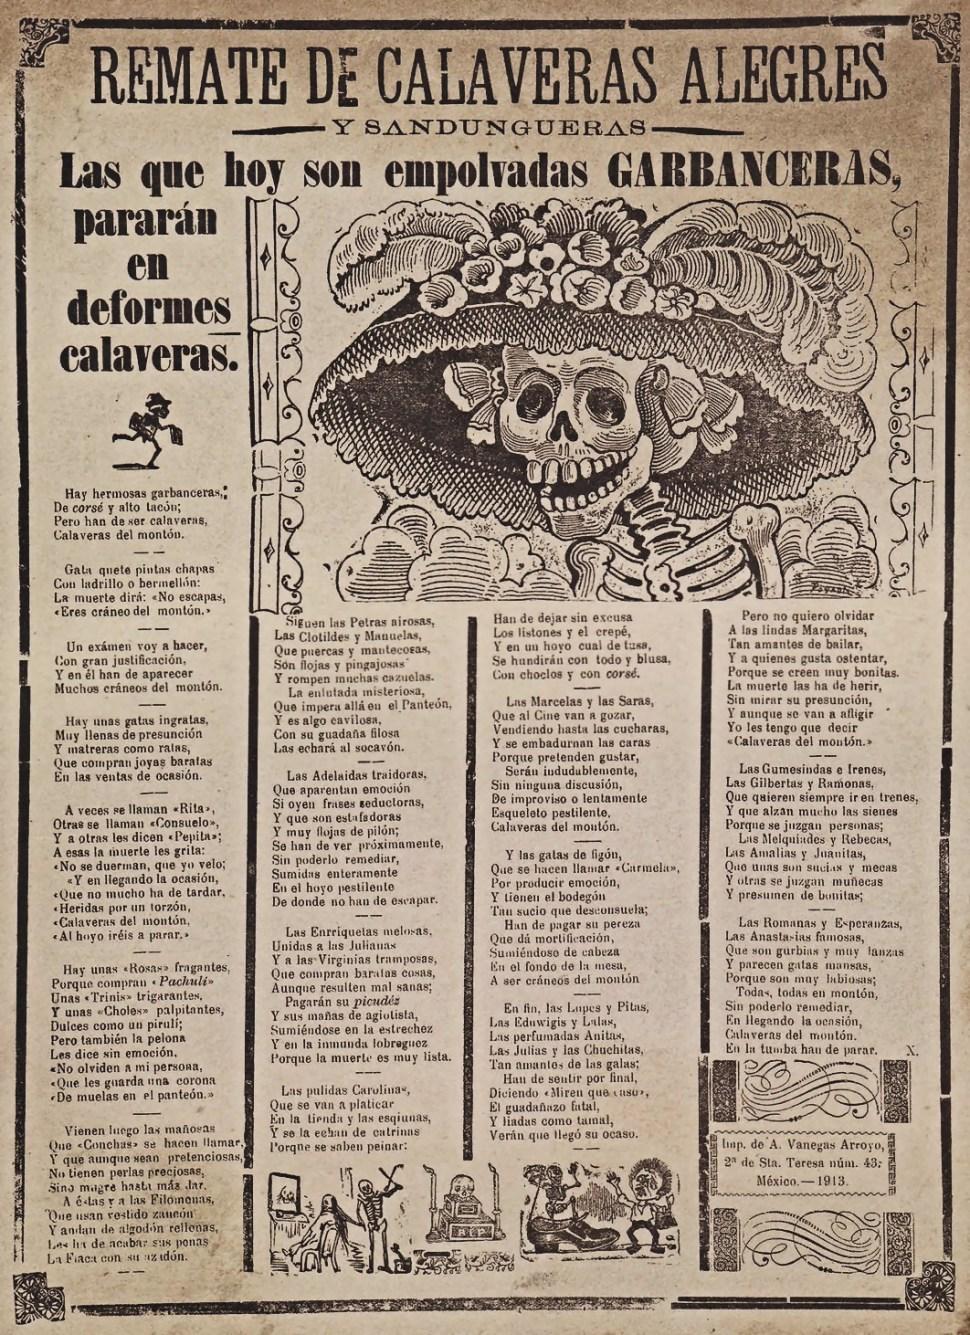 Calavera-garbancera-jose-guadalupe-posada